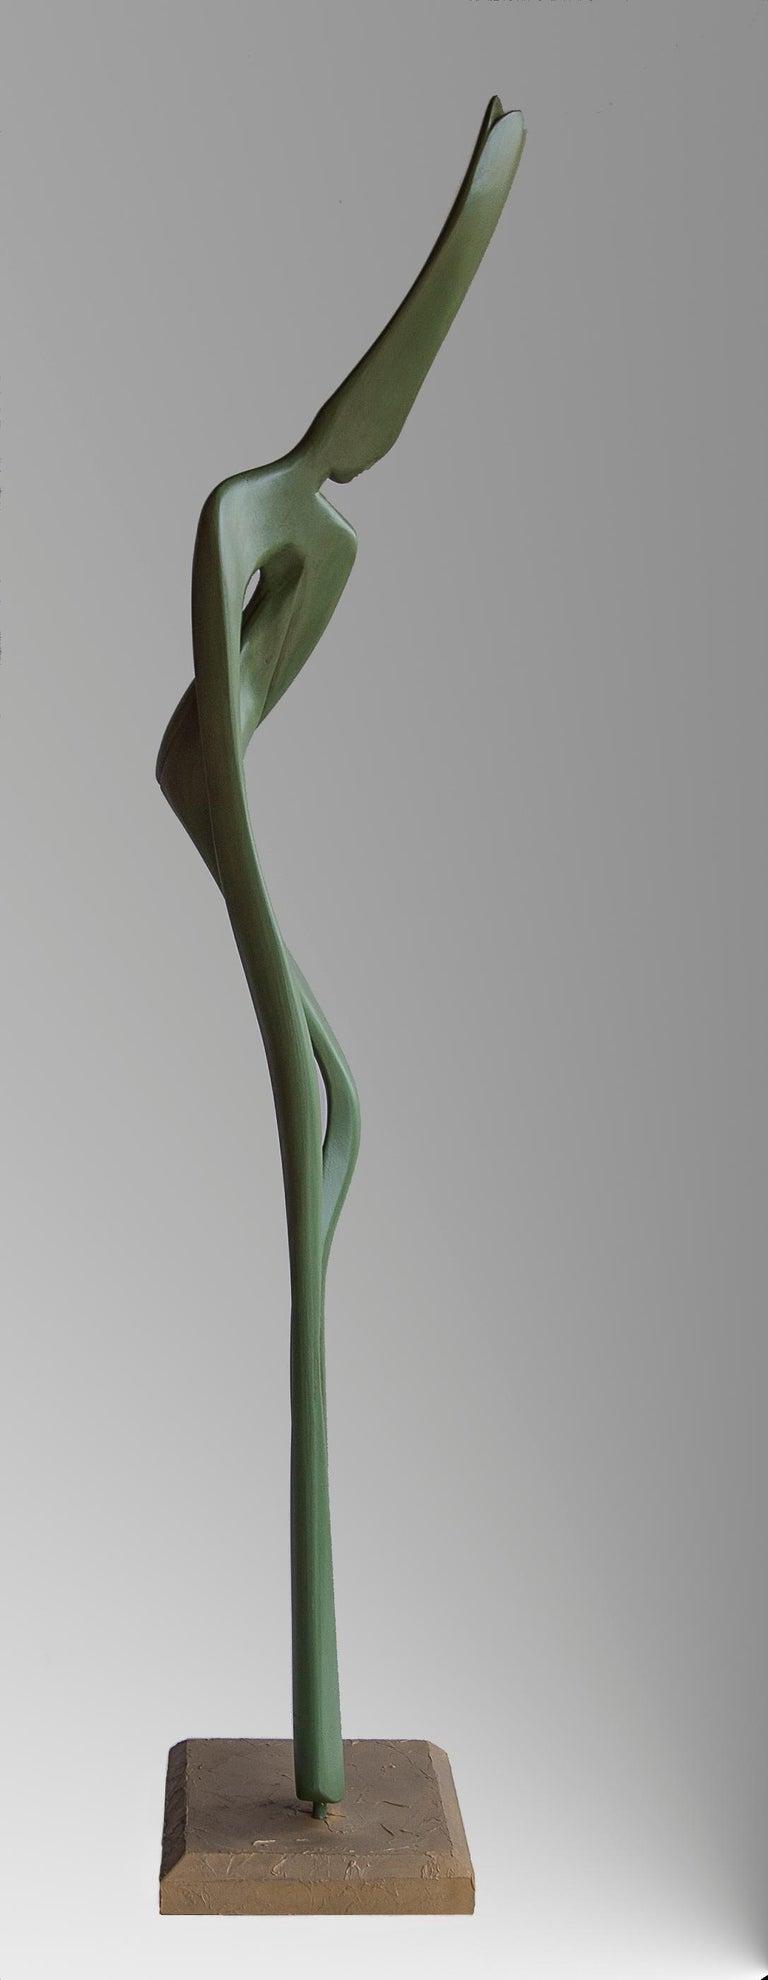 Liana, Green Sensual Slender Oak Wood Figurative Abstract Sculpture For Sale 4